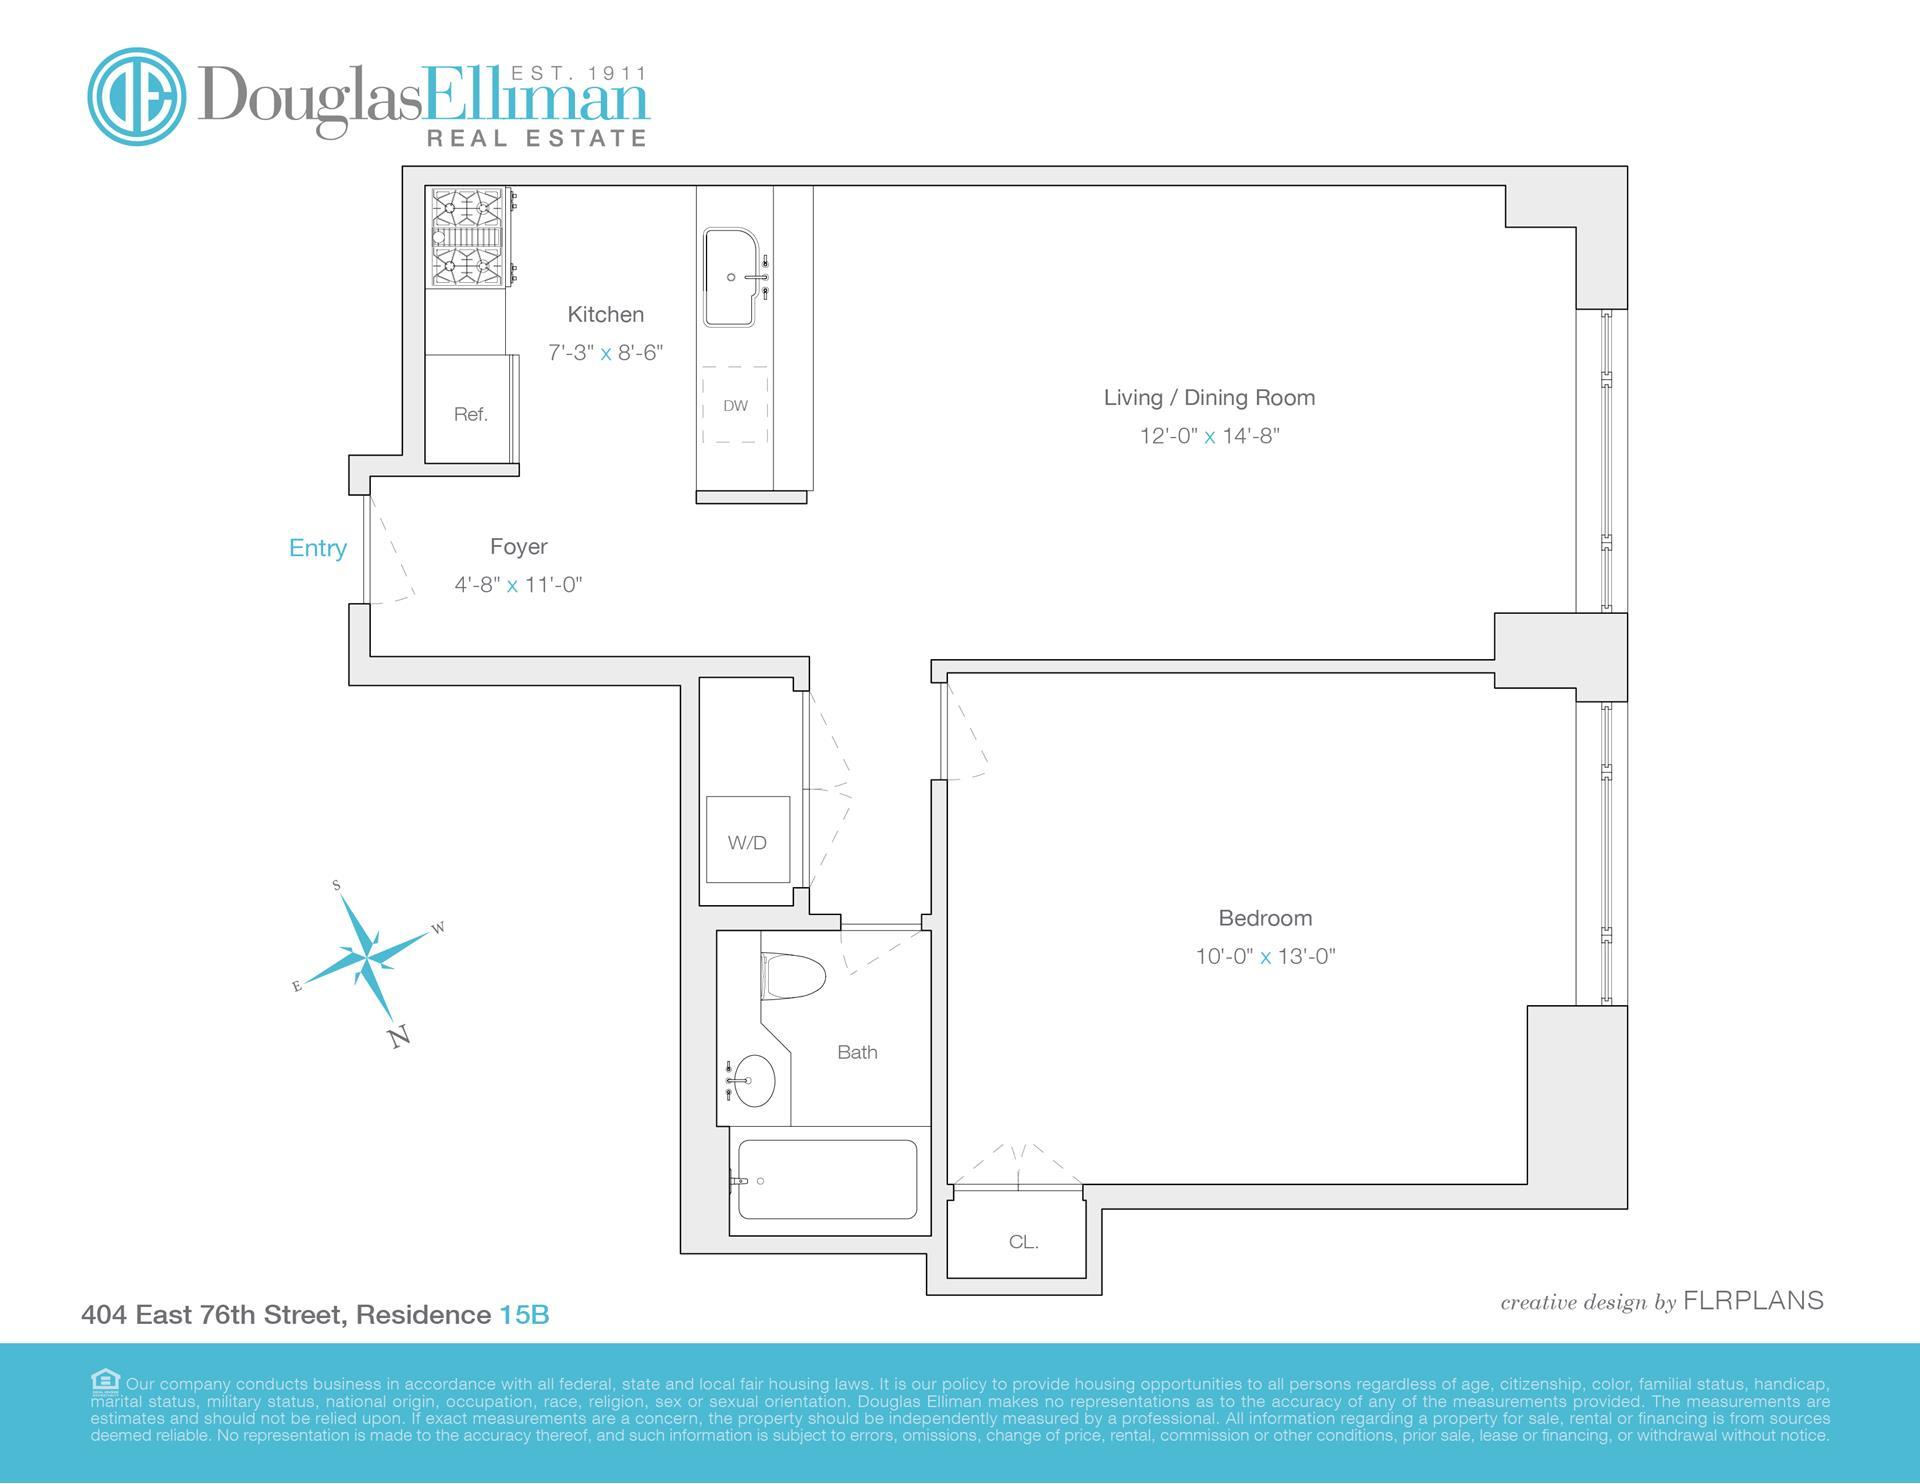 Floor plan of THE IMPALA, 404 East 76th St, 15B - Upper East Side, New York